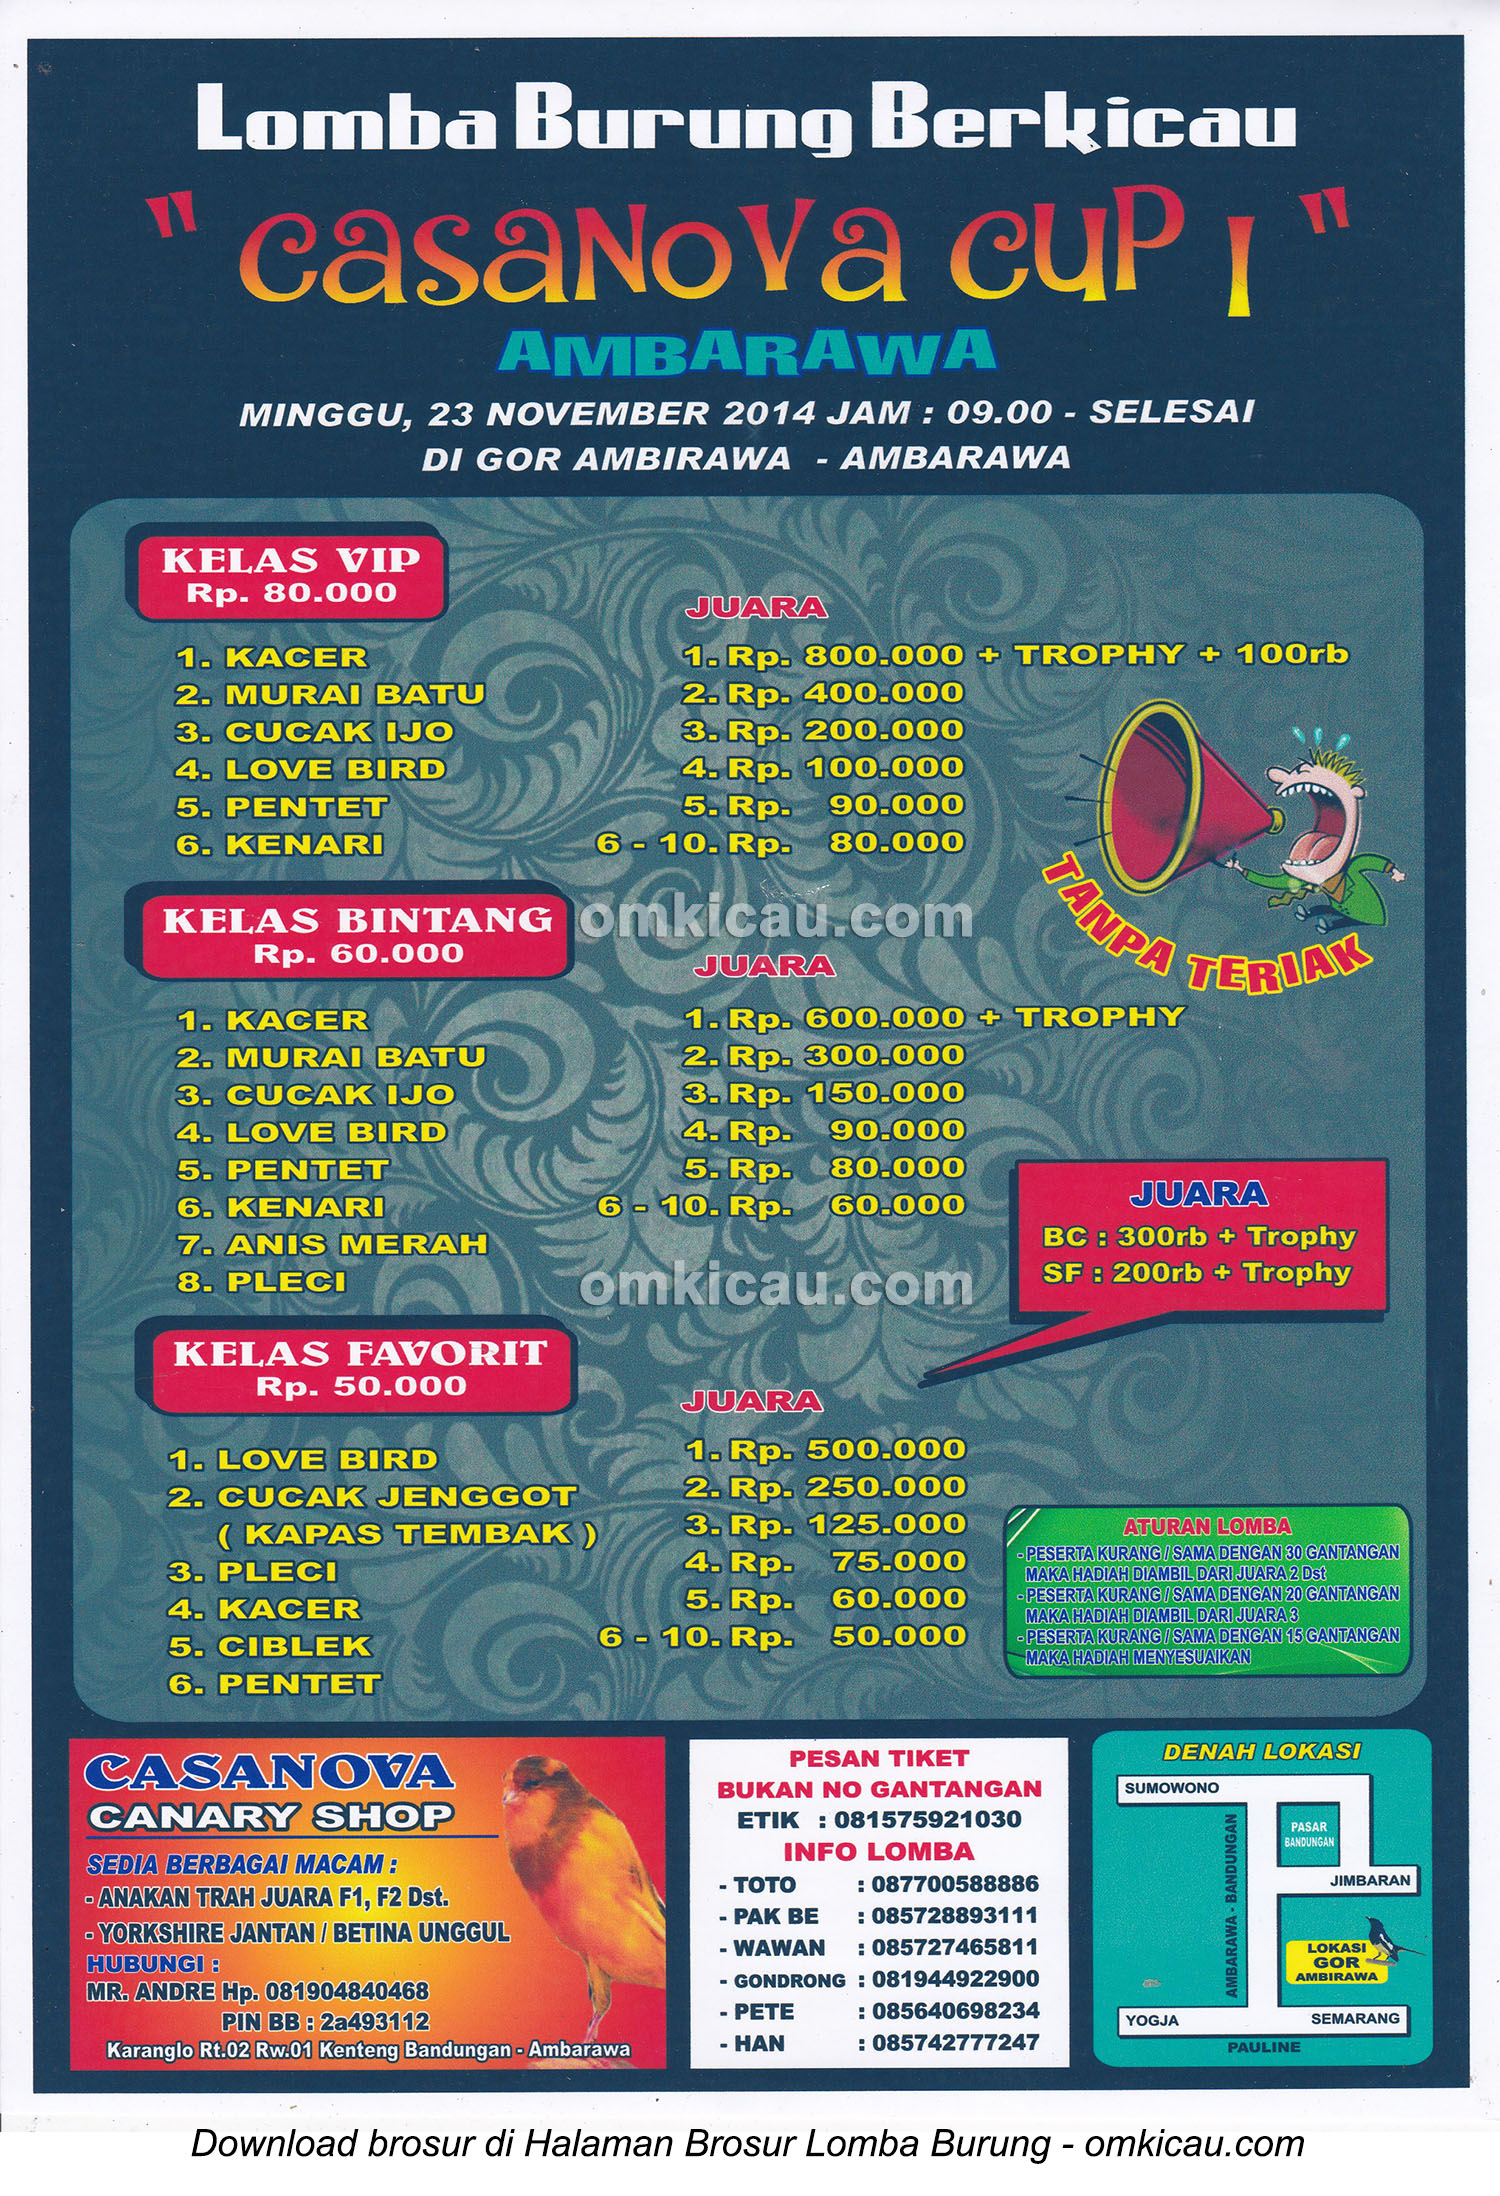 Brosur Lomba Burung Berkicau Casanova Cup I, Ambarawa, 23 November 2014